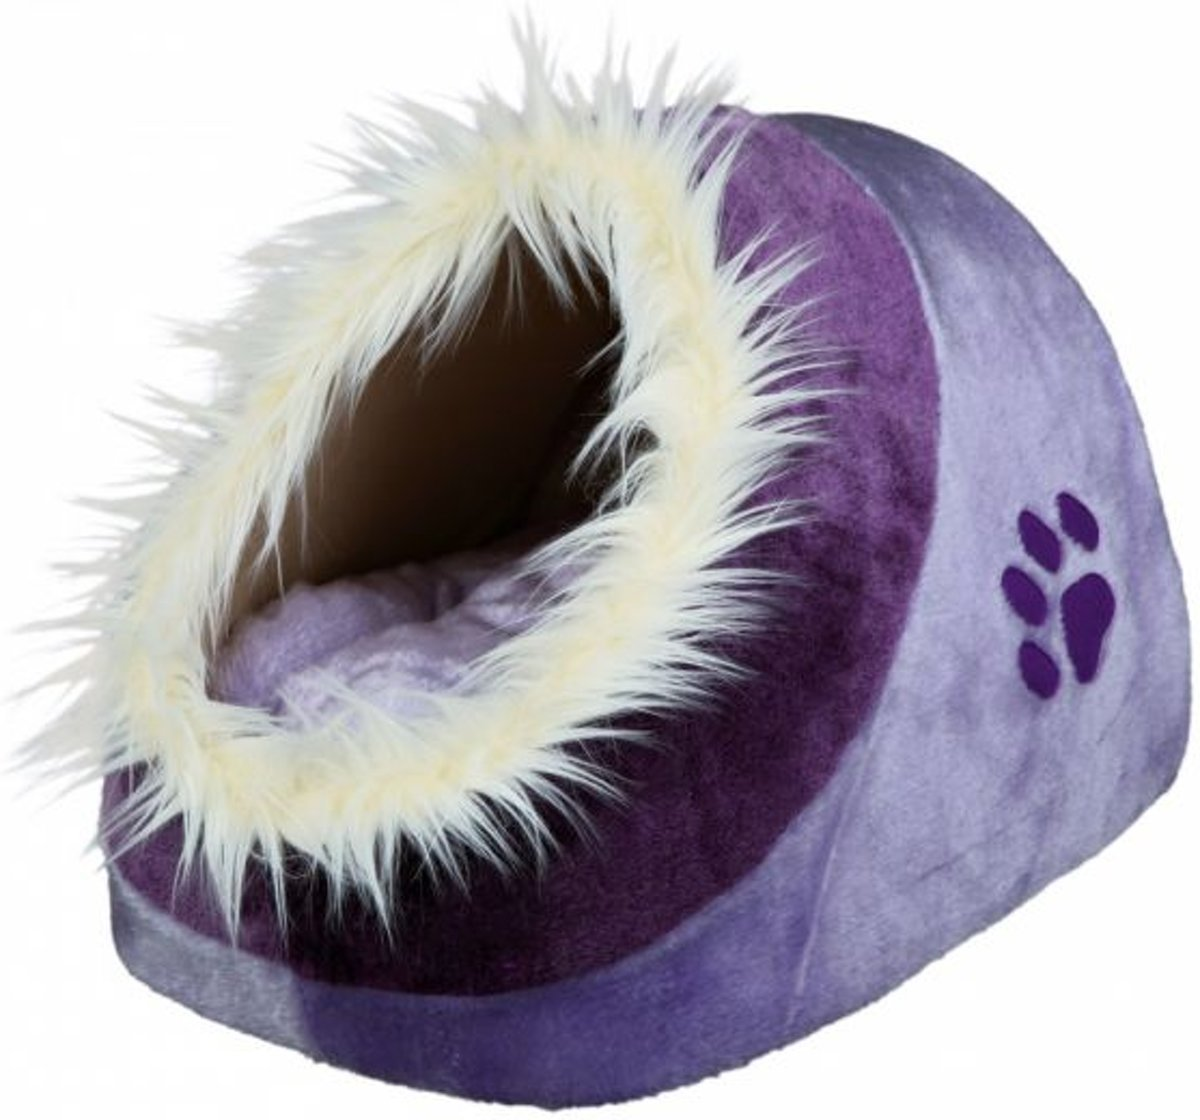 Trixie kattenmand iglo minou lila / violet 35x26x41 cm